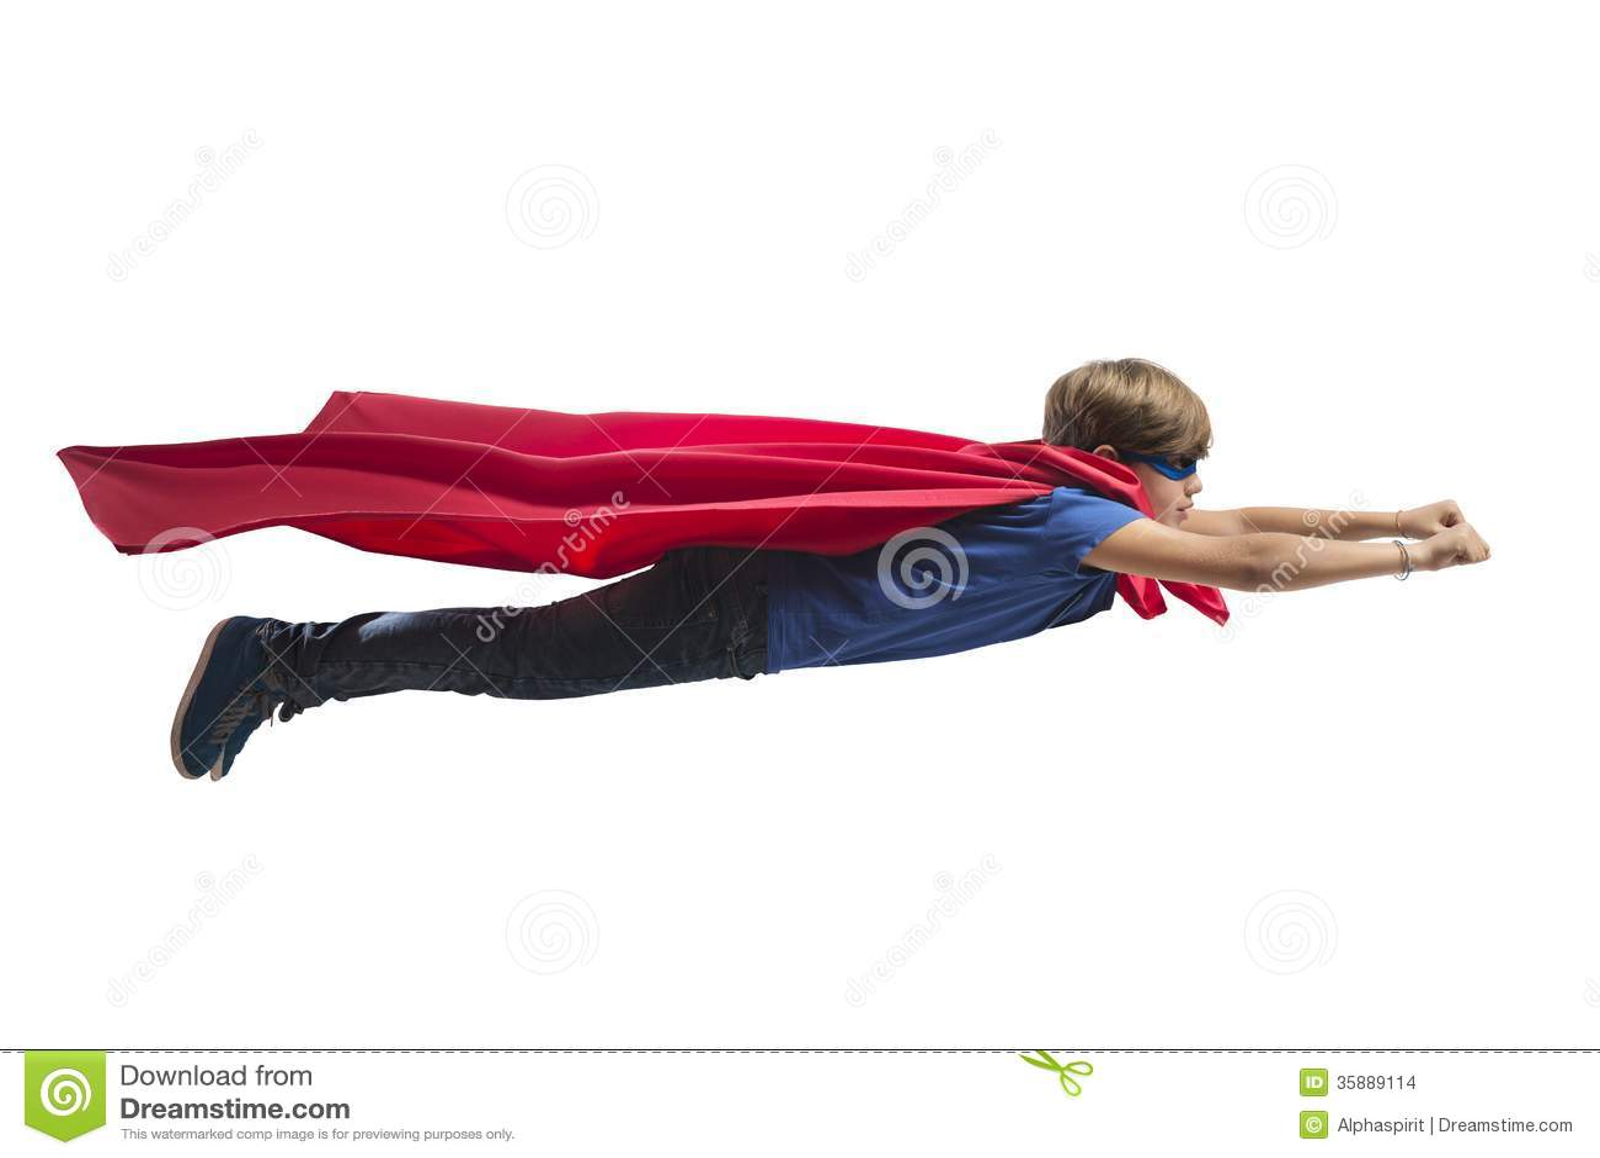 Superhero Kid Stock Images - Image: 35889114 Superhero Flying Vector